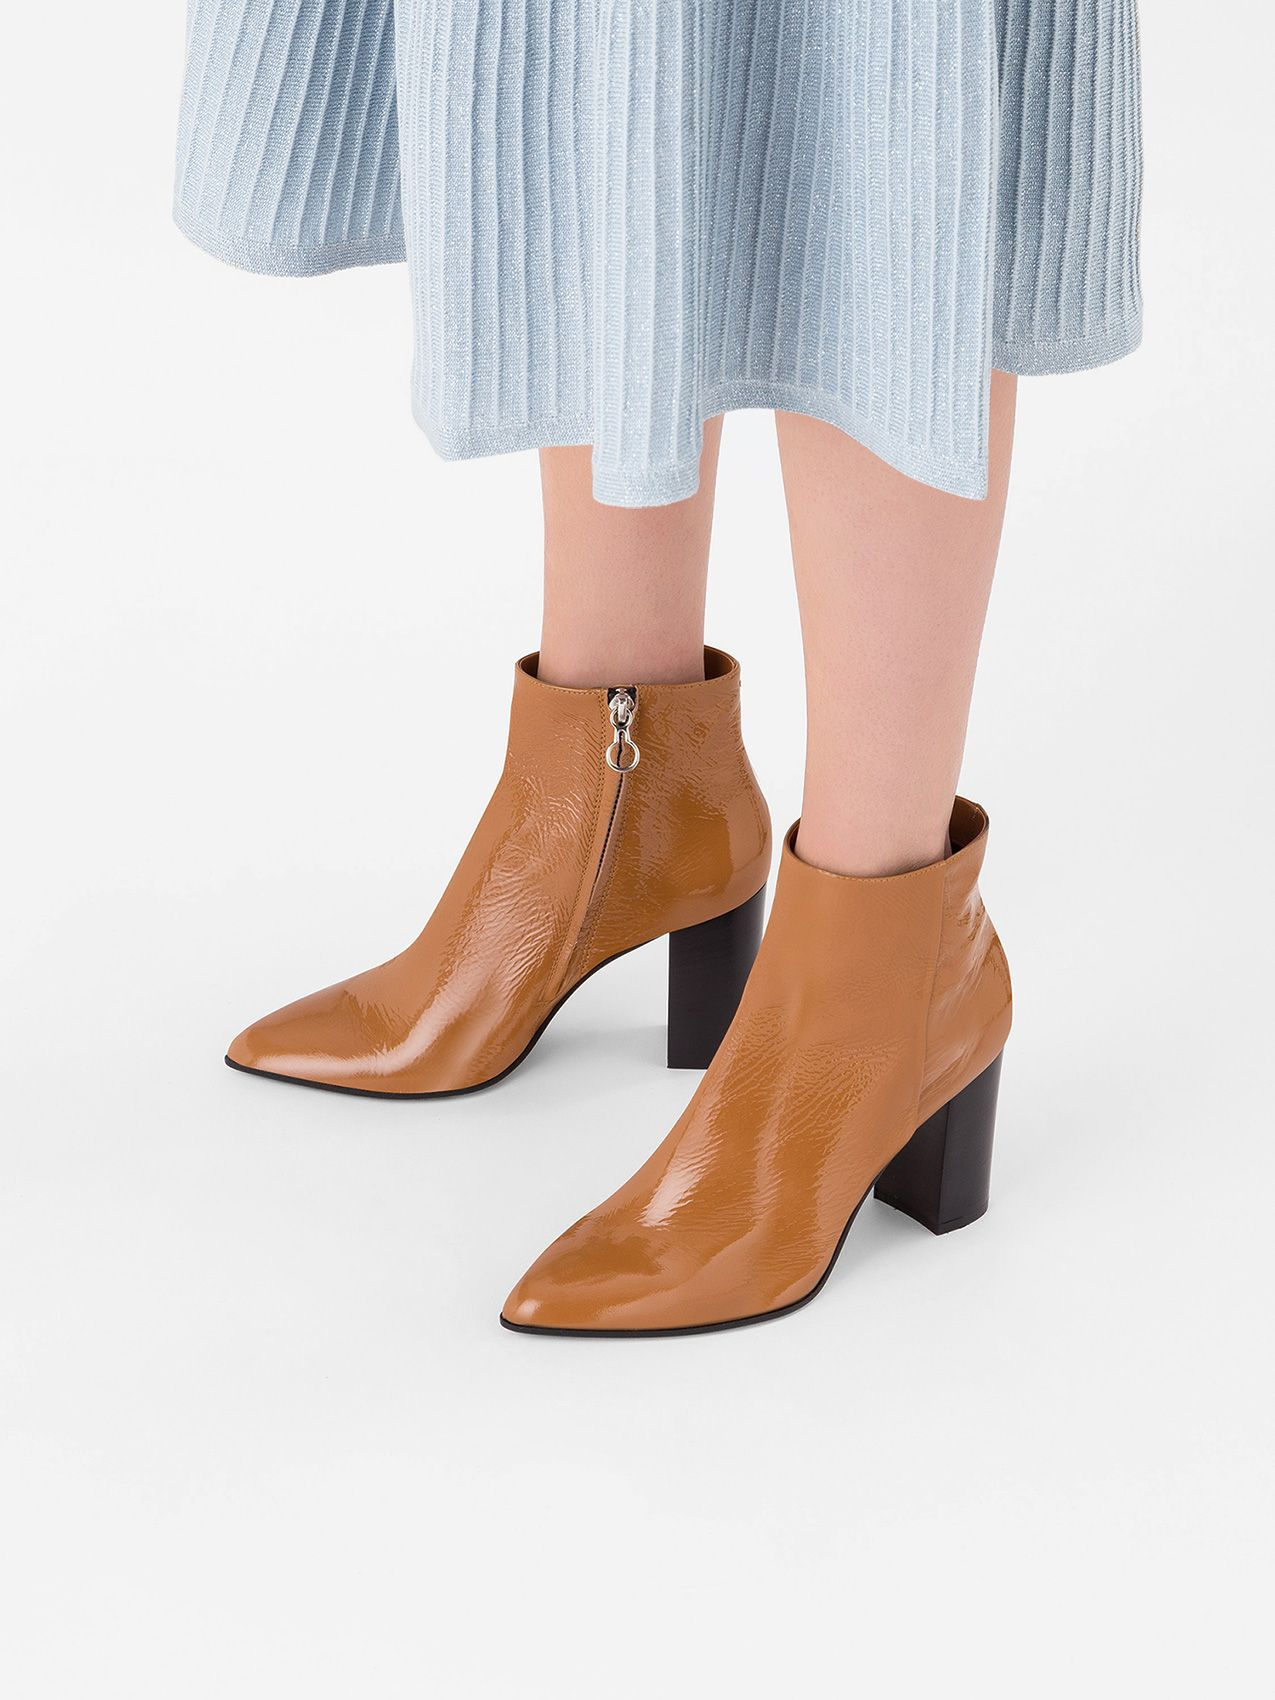 women ankle boots - peanut butter